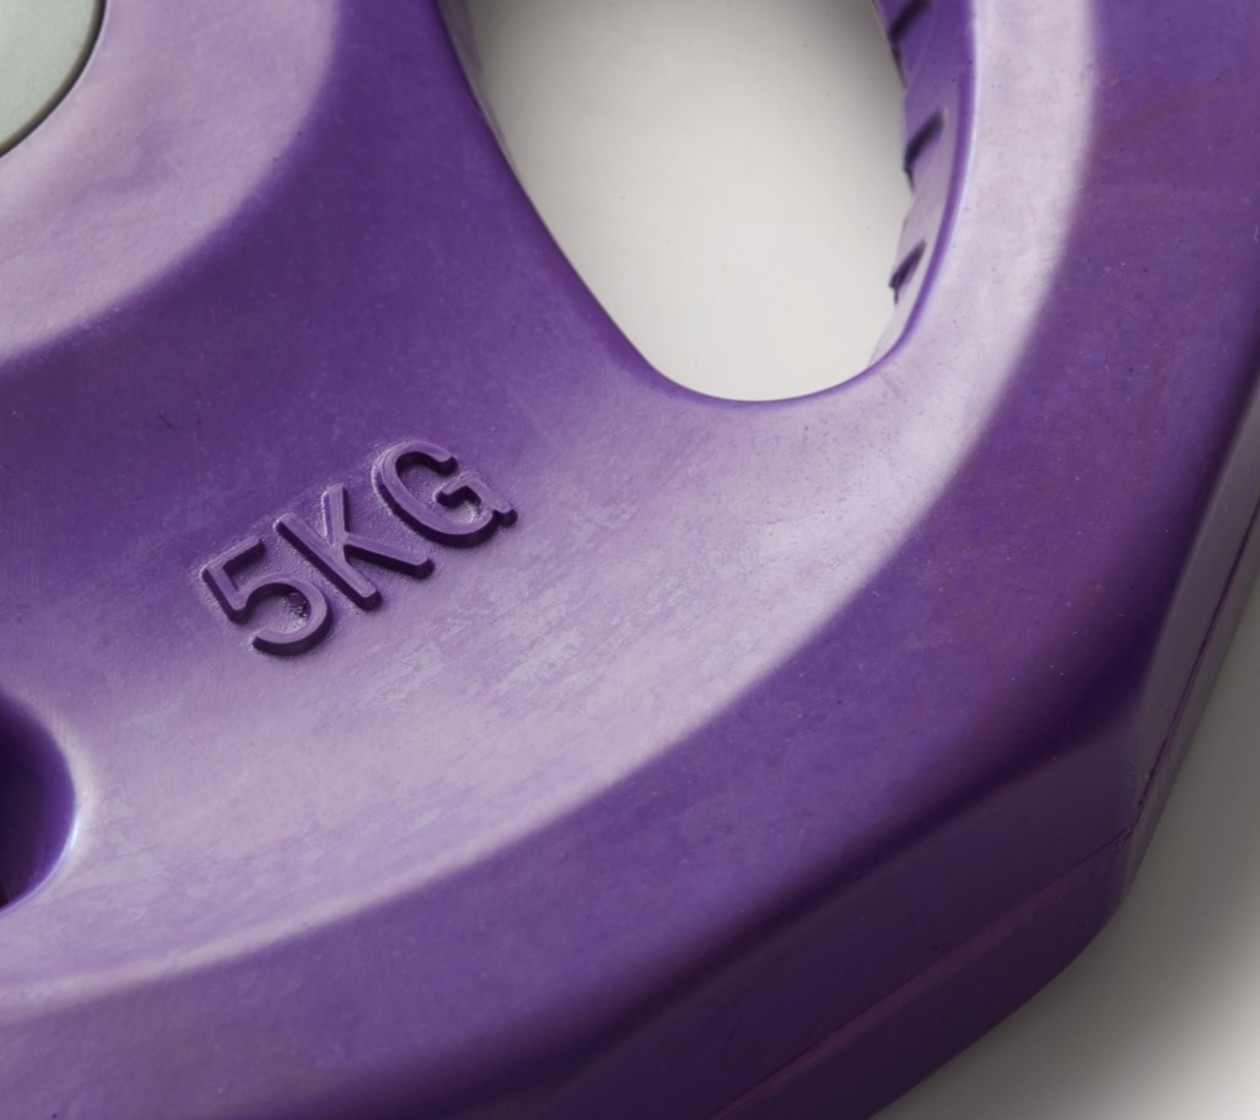 Poids de 5 kg - 2x